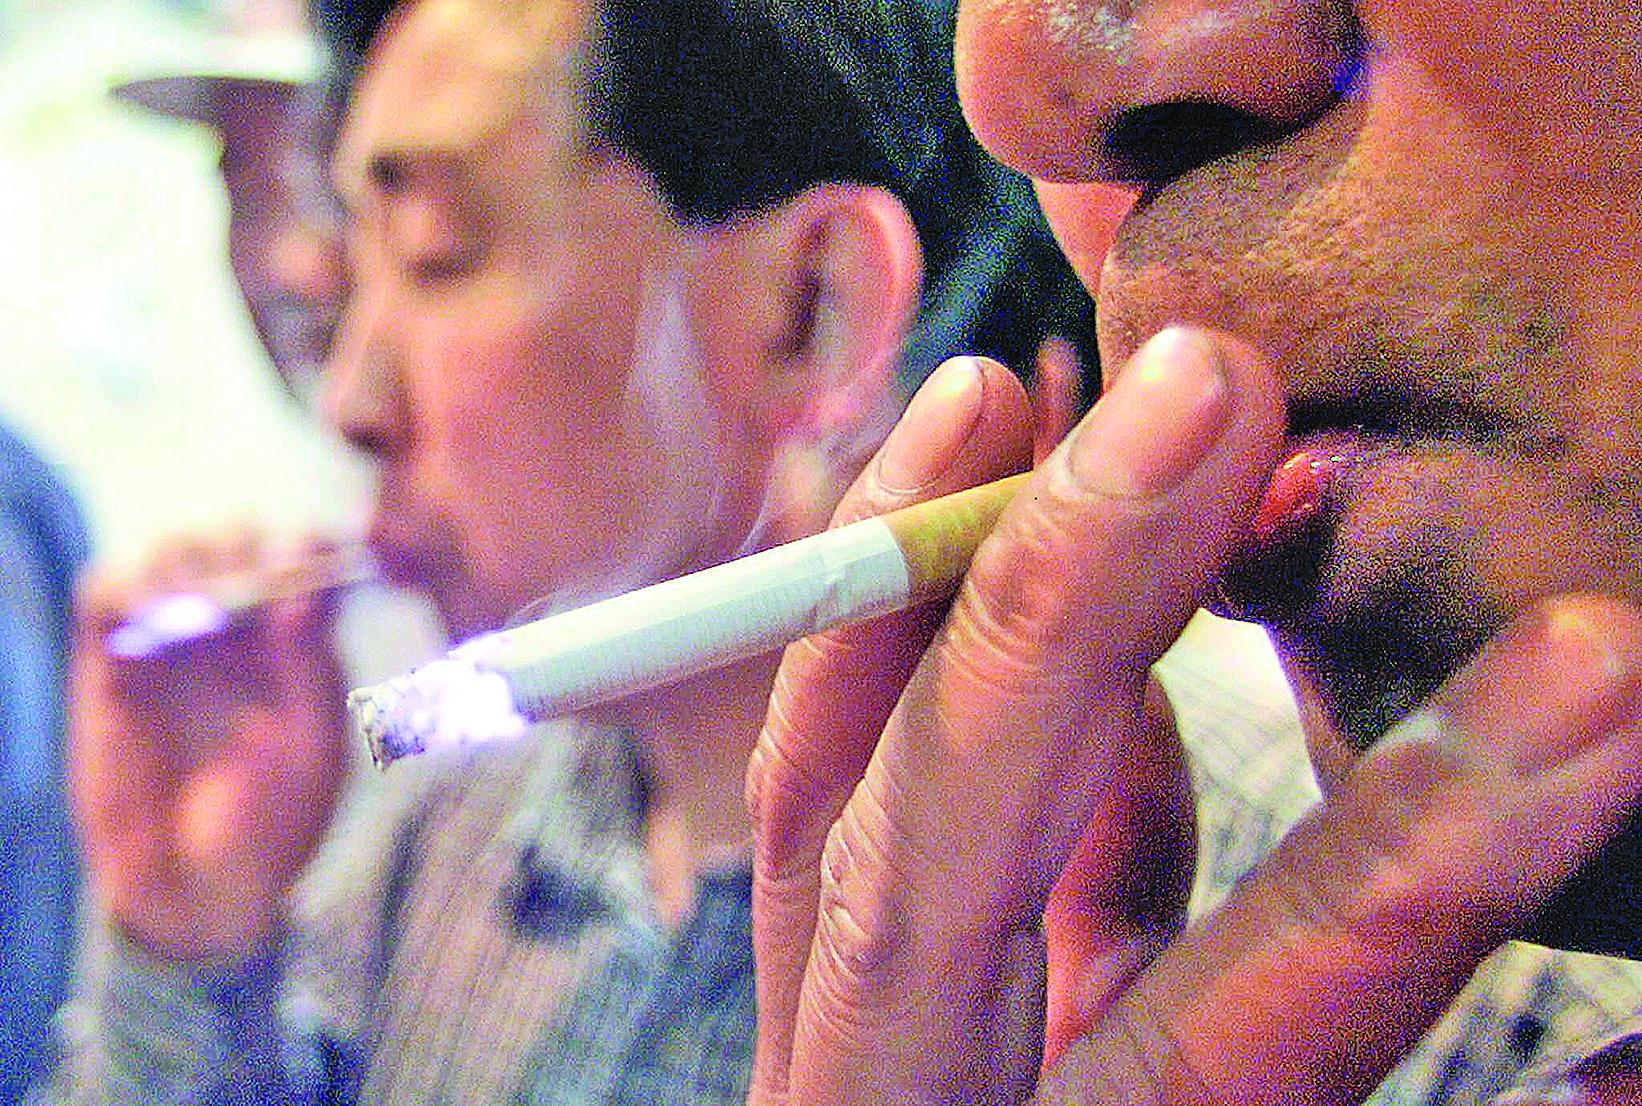 WHO和UNDP表示,中共對源自煙草企業收入的依賴與其宣稱的打造「健康中國」的口號背道而馳。(AFP)